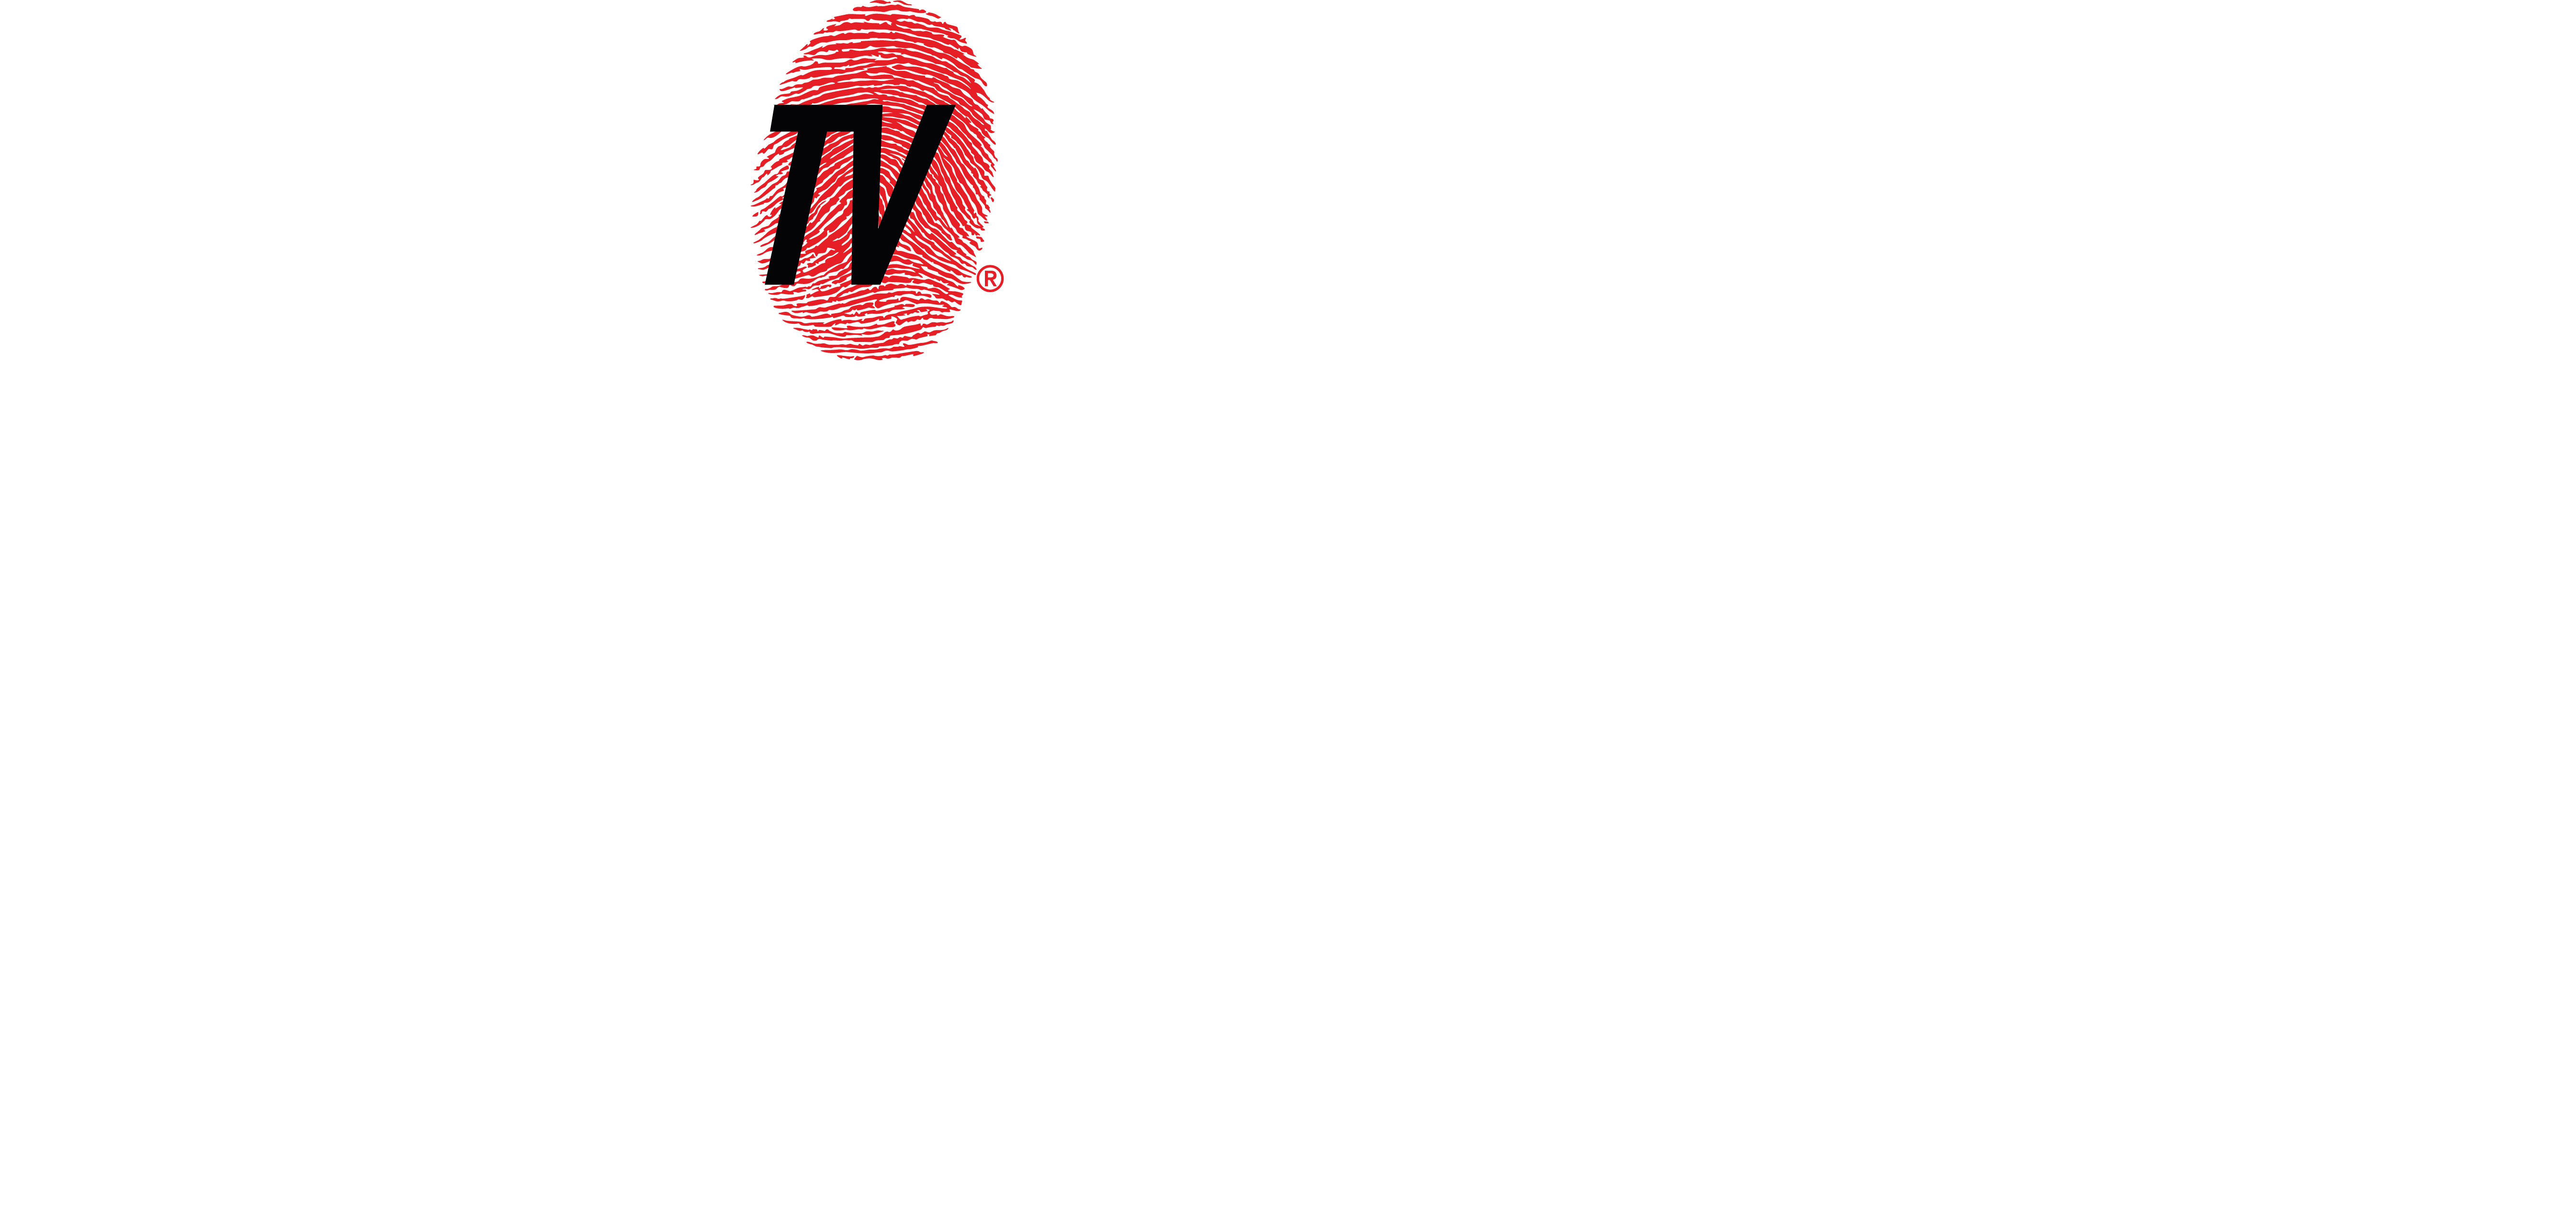 Court TV Mystery - Court TV